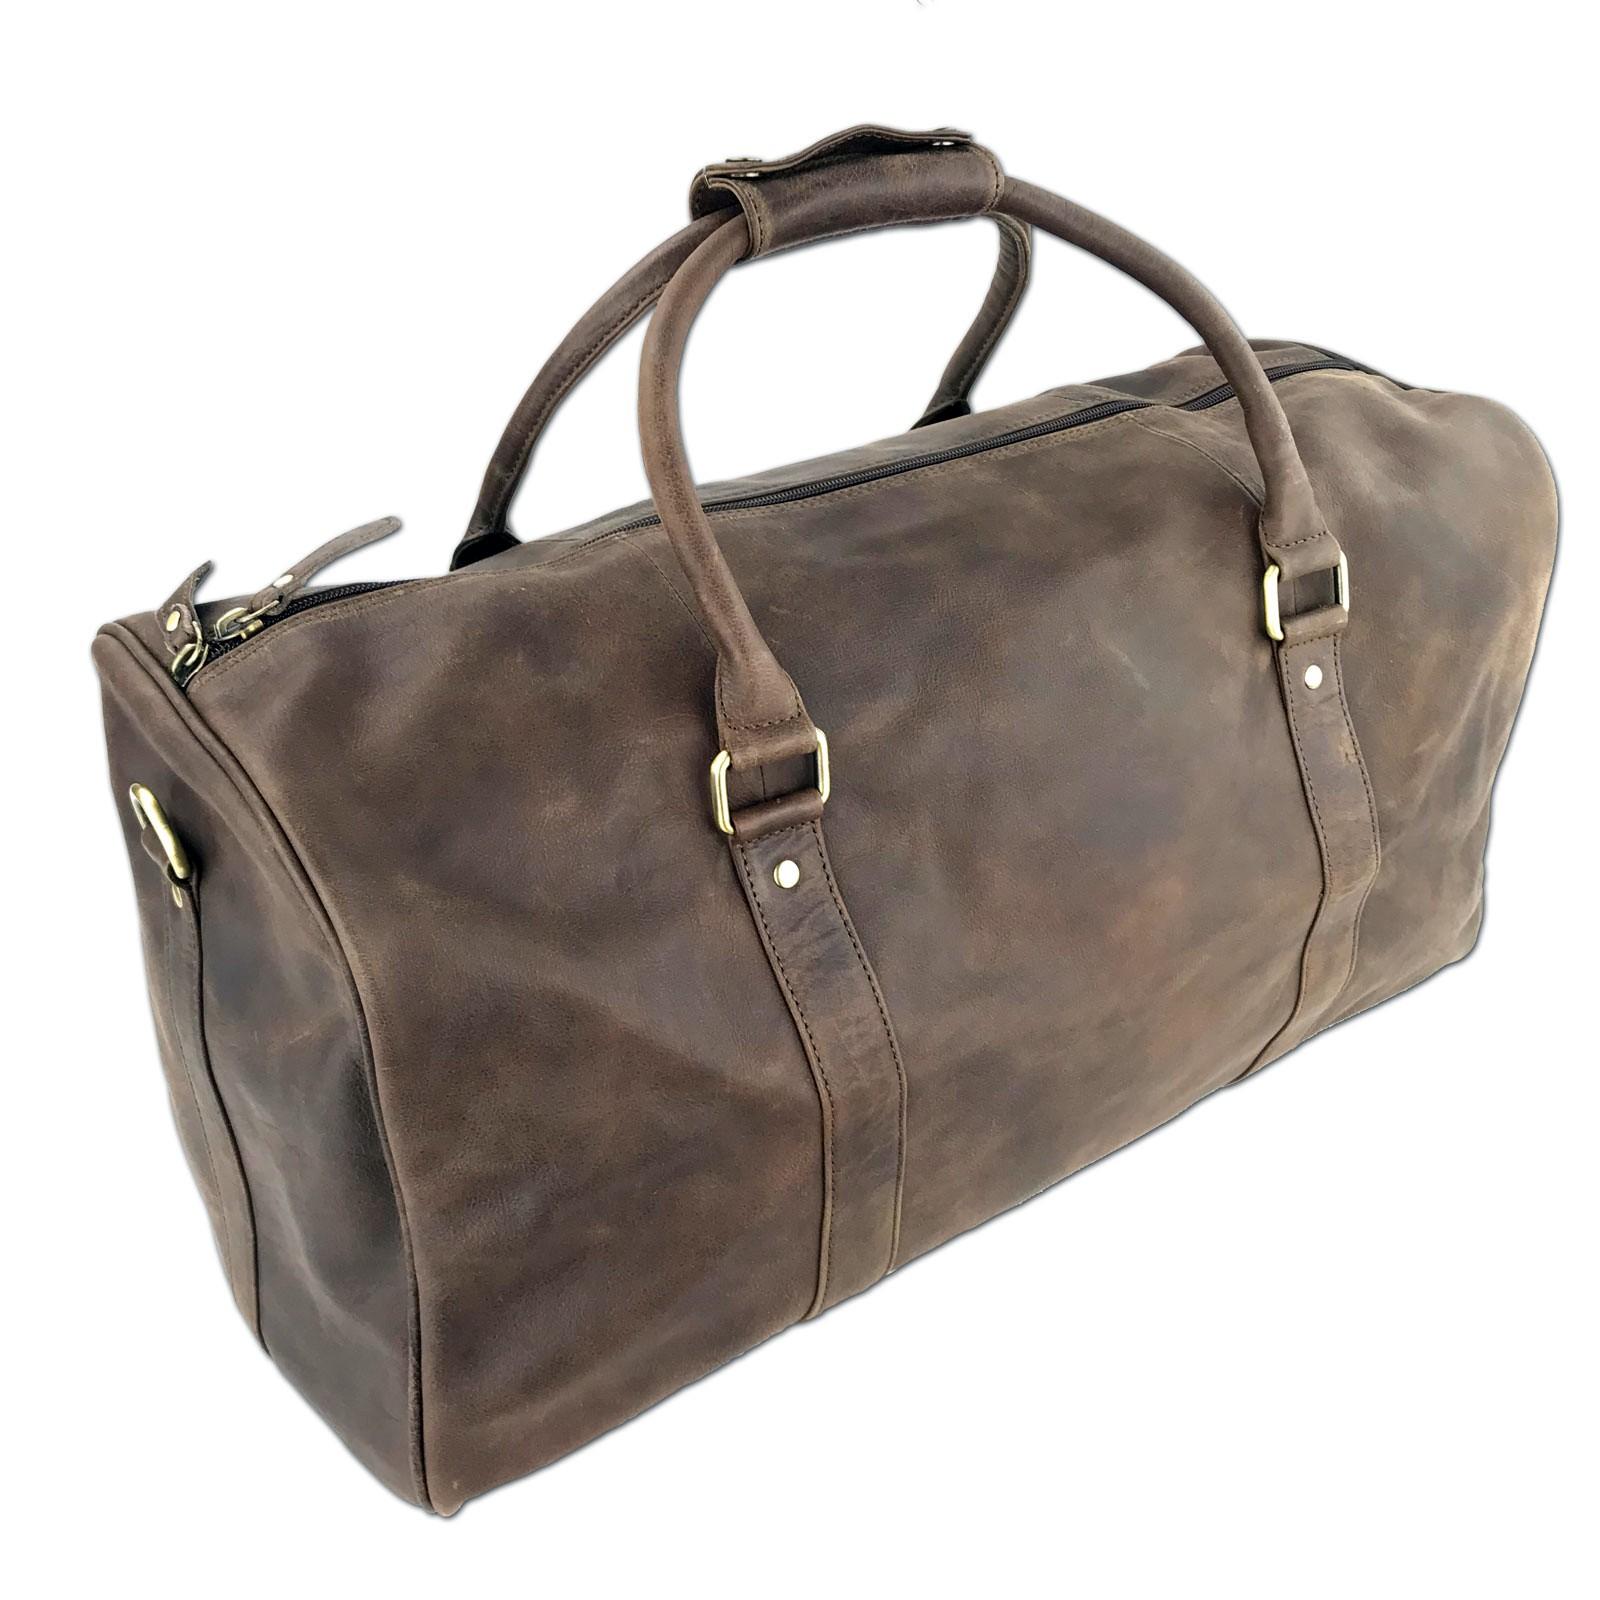 Db001cr Mens Full Grain Leather Duffle Bag